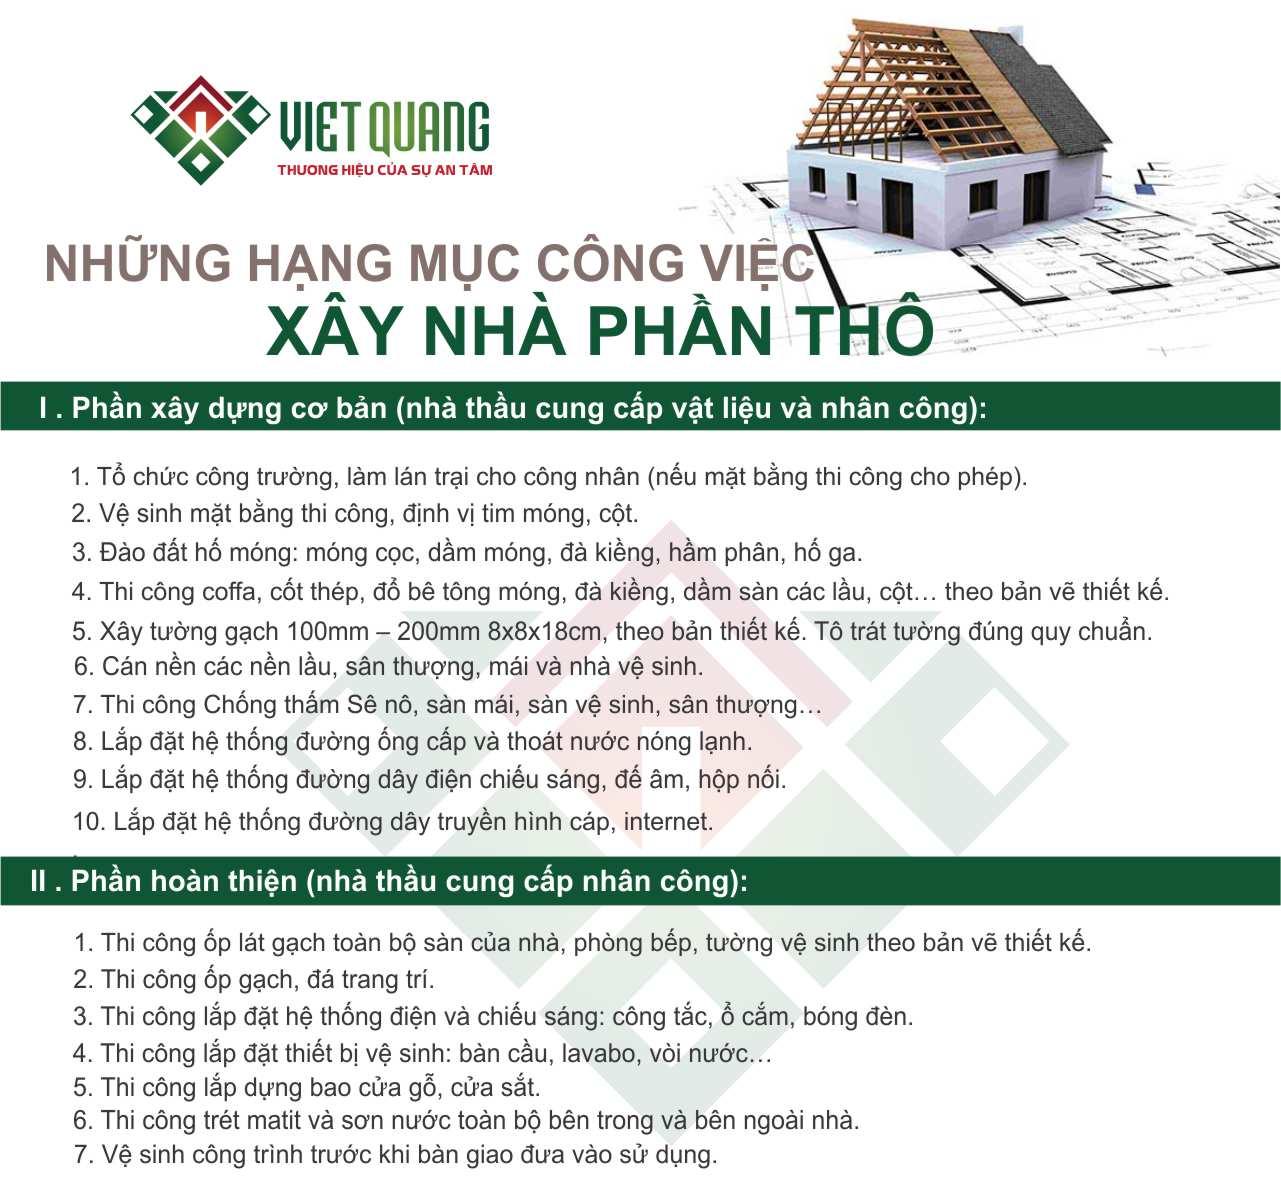 hang-muc-cong-viec-xay-nha-phan-tho